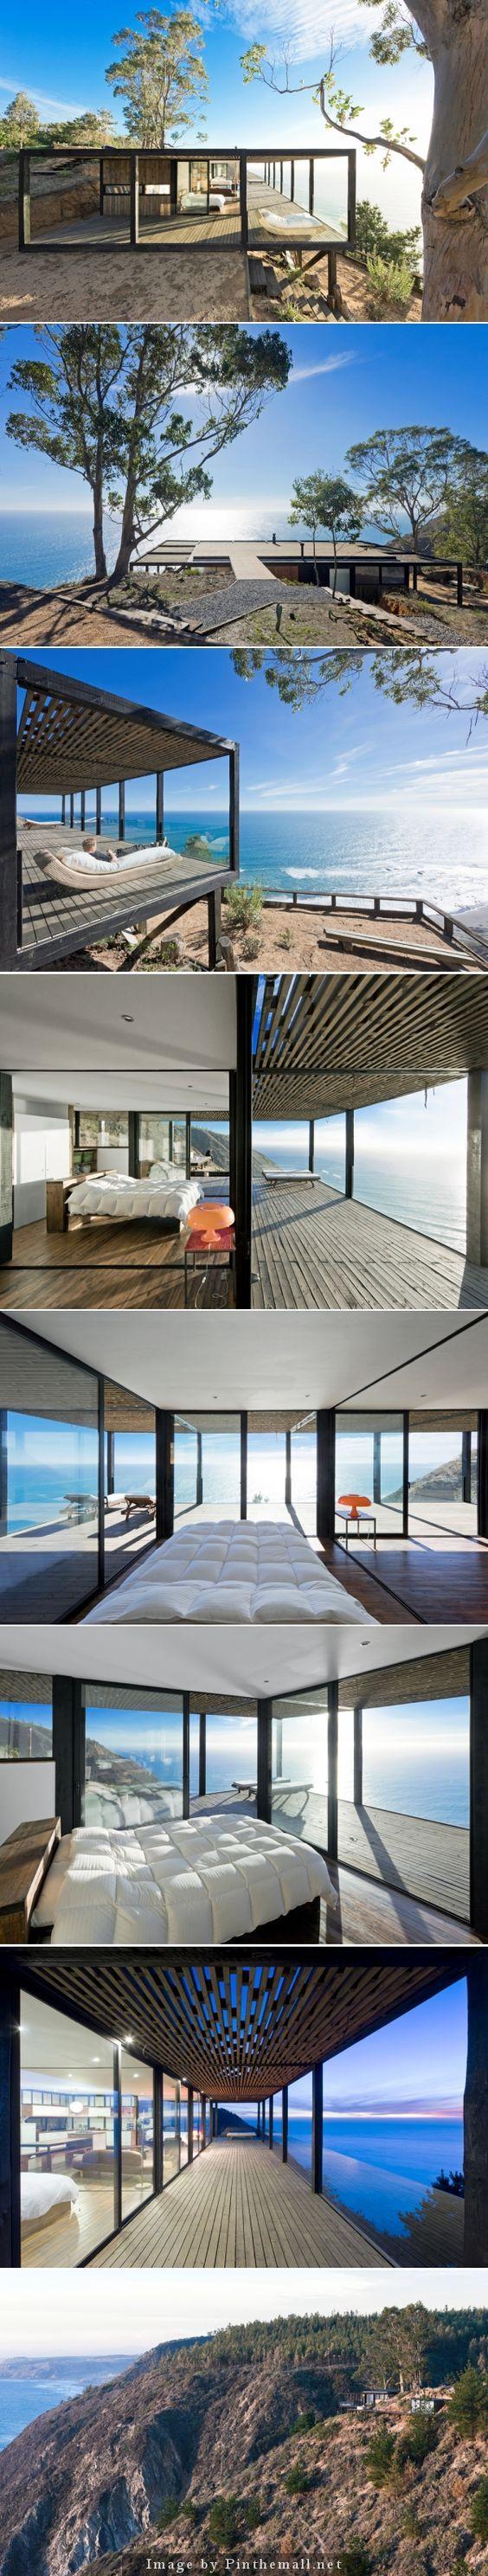 Casa Till, a new private home by WMR Arquitectos.   http://www.knstrct.com/architecture-blog/2014/4/13/casa-till-by-wmr-arquitectos - created via http://pinthemall.net: